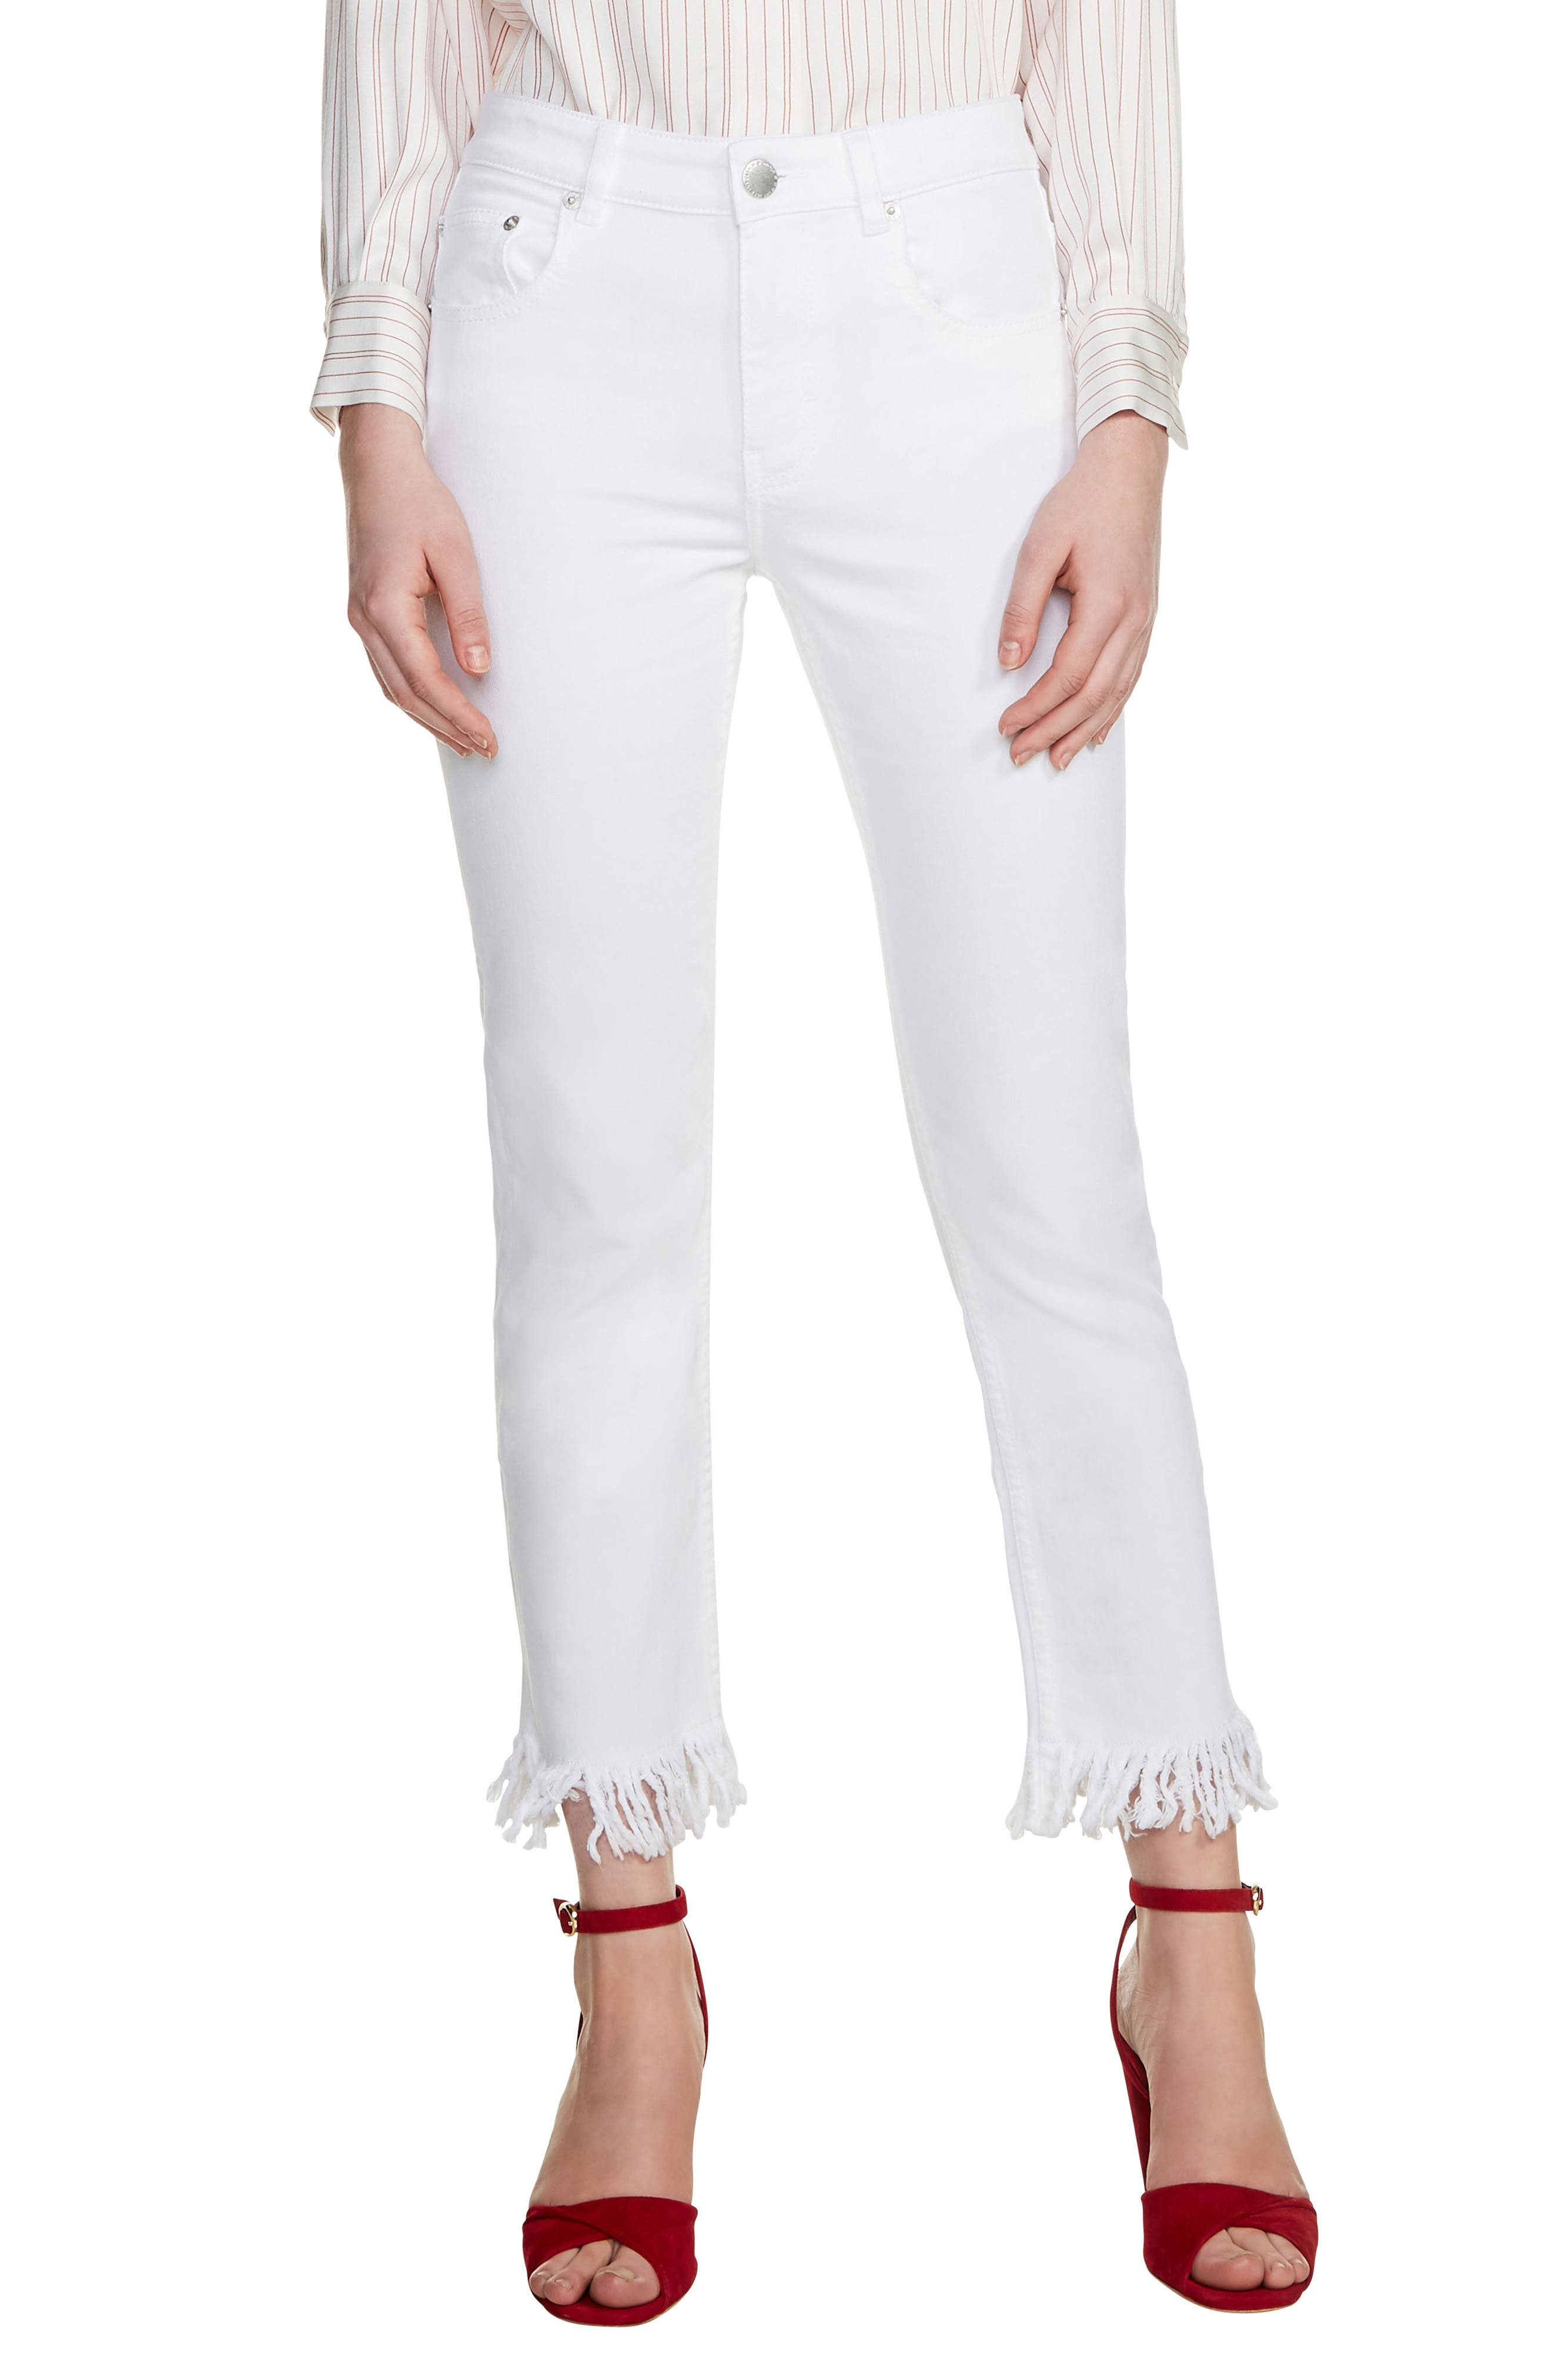 Panaki Fringe Straight Leg Jeans,                         Main,                         color, 100